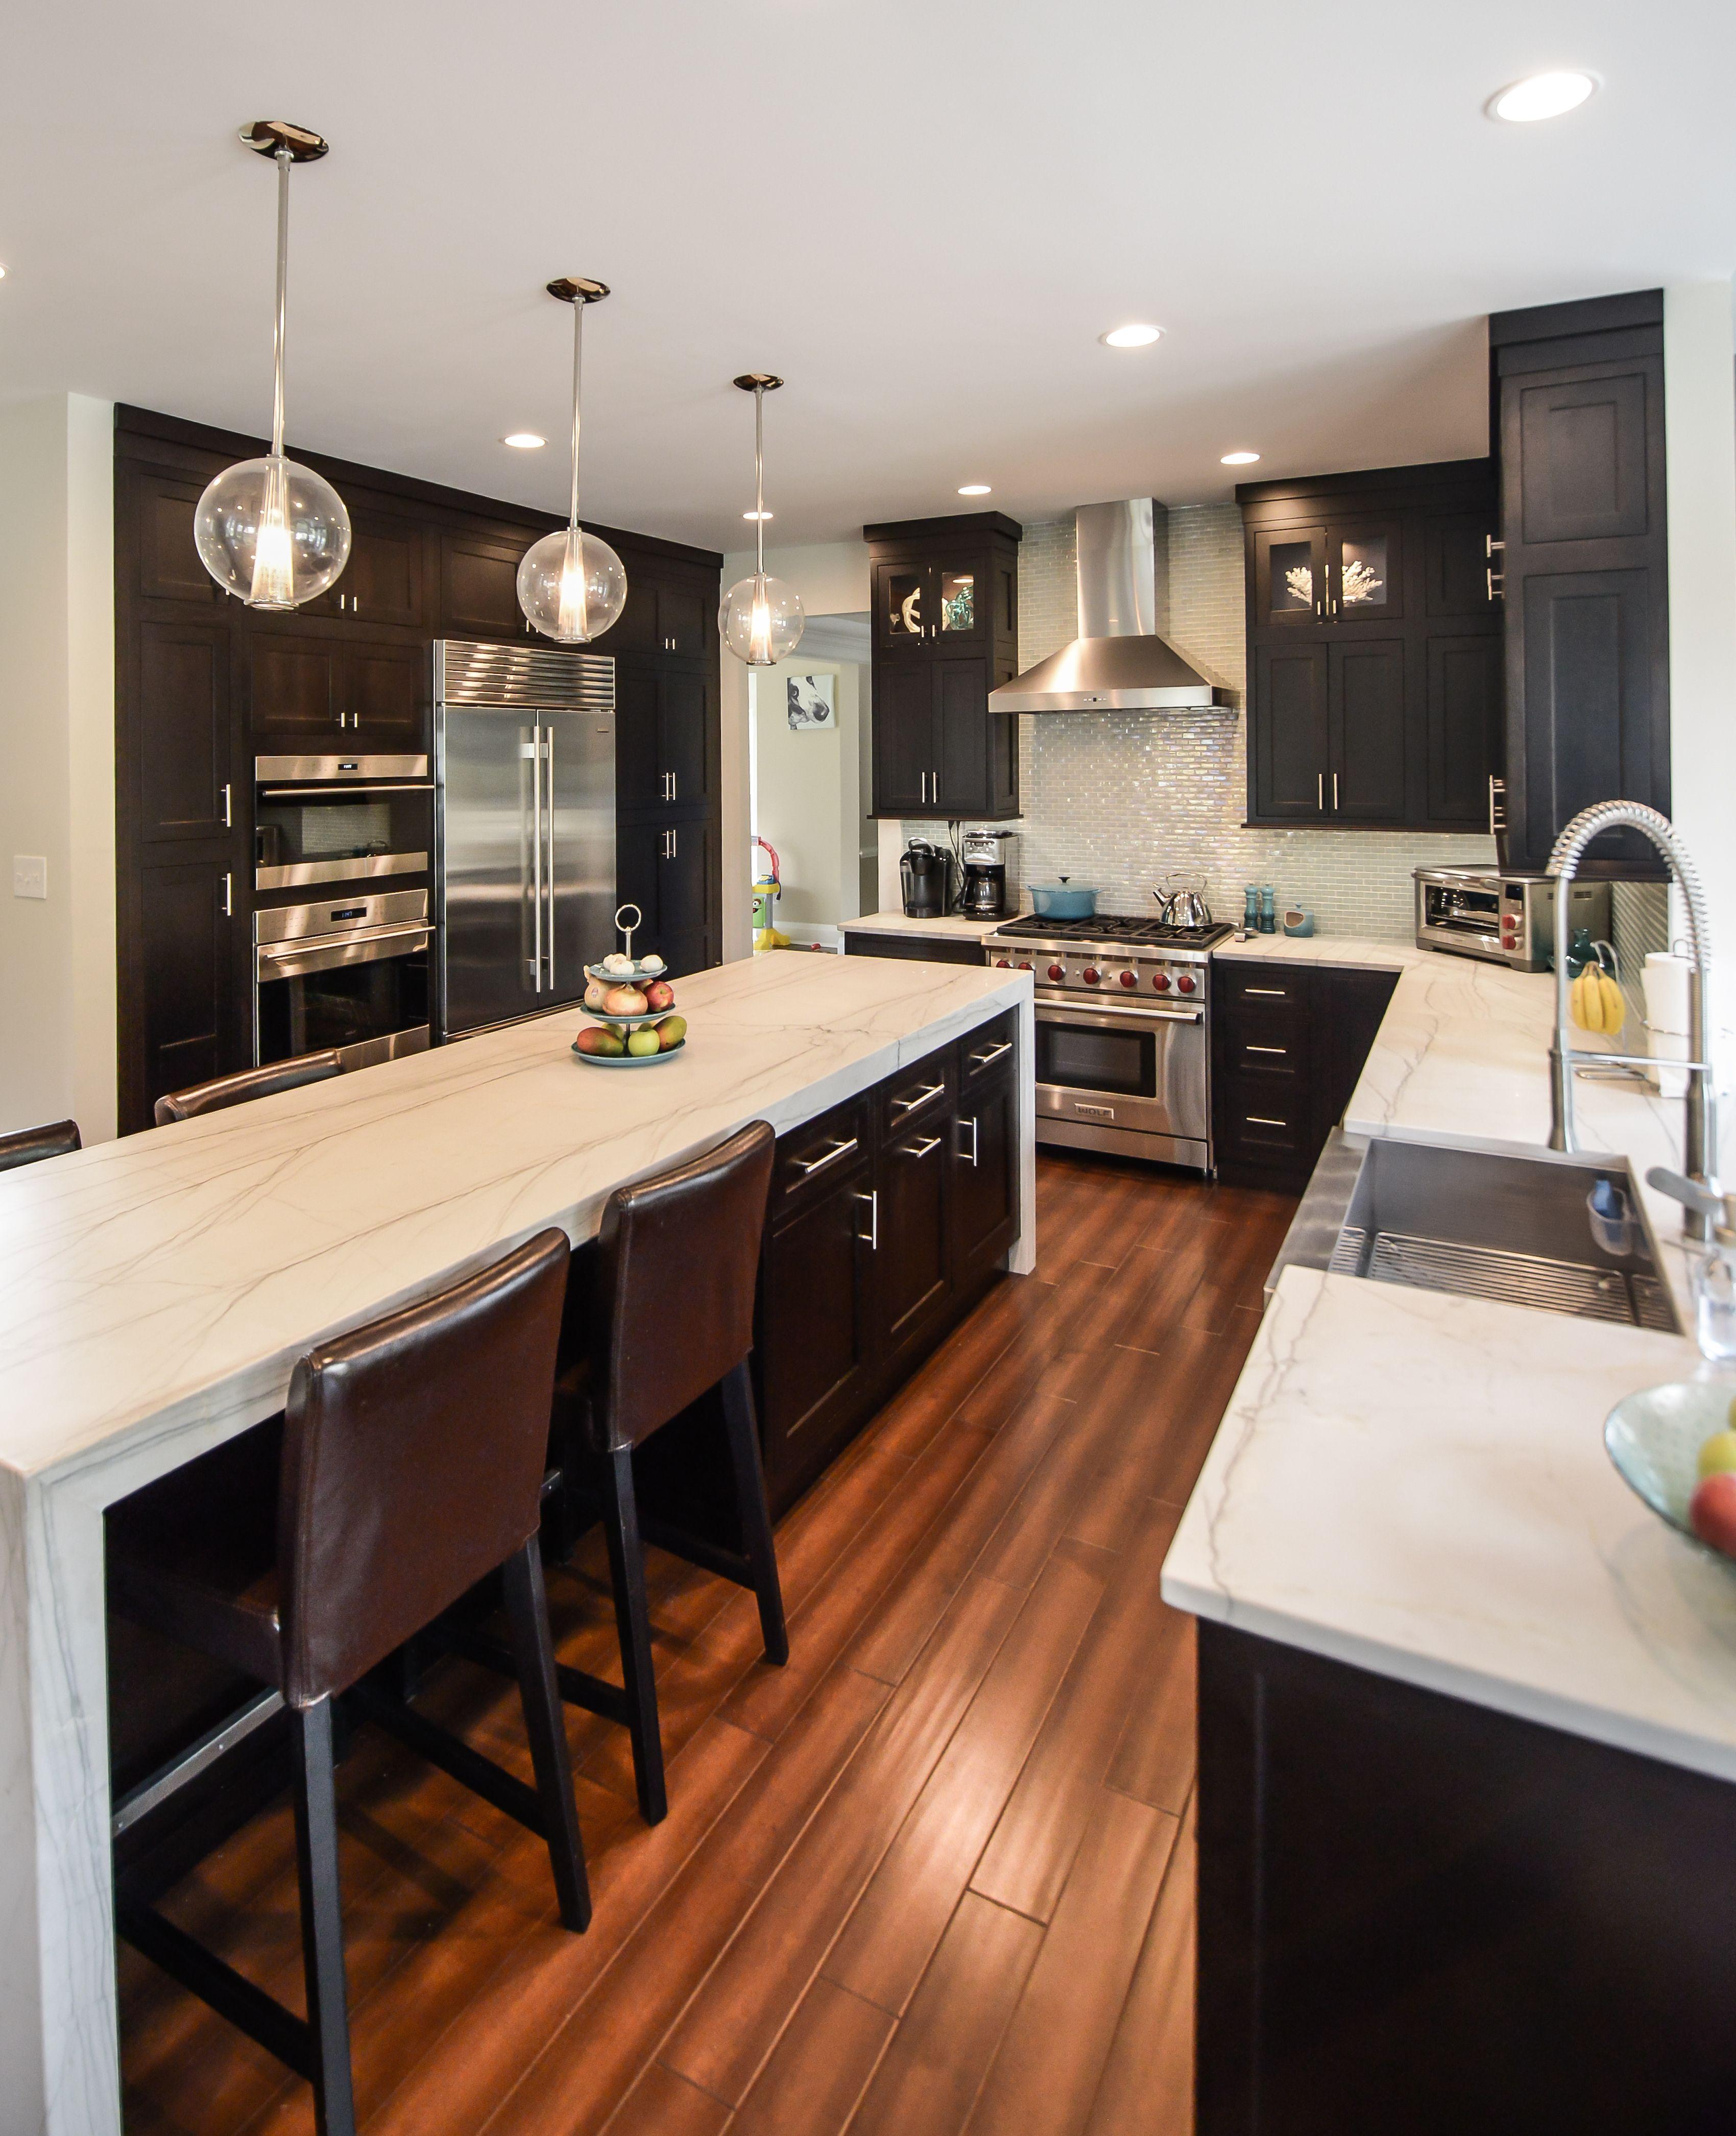 Kitchen Quartz Countertops: White Macaubas Honed Quartzite Countertops With A Box